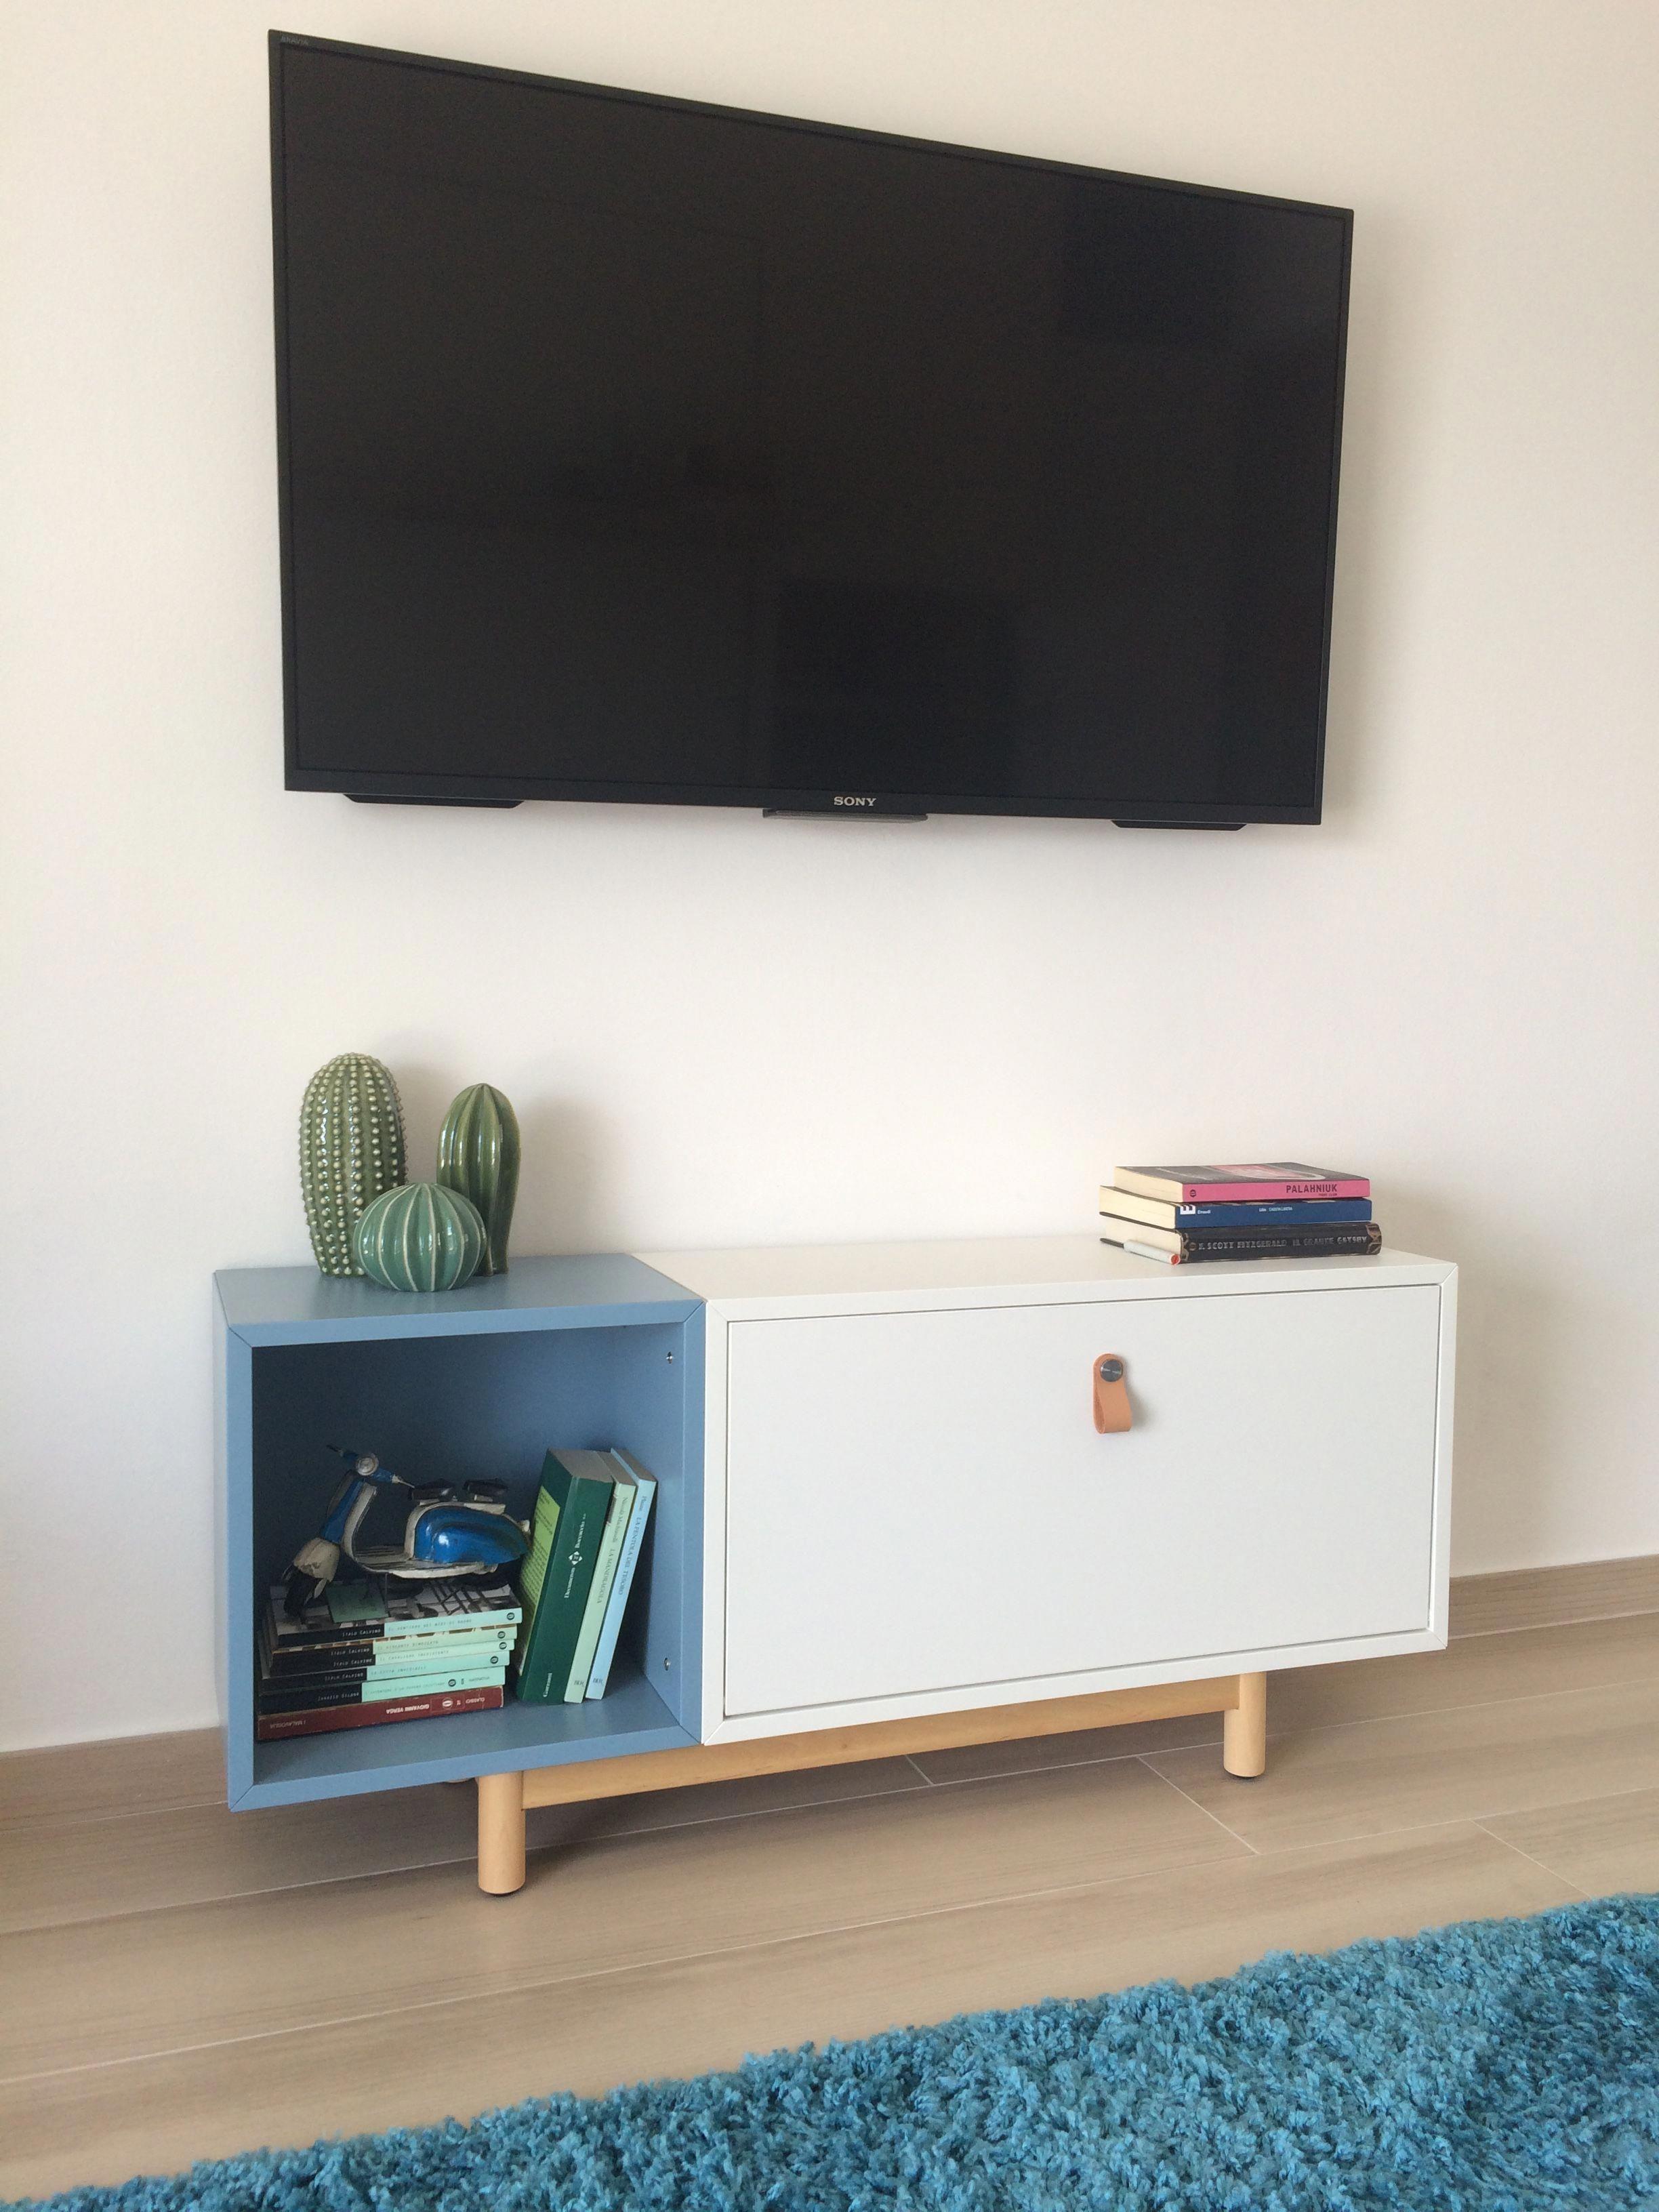 eket ikea hack console tv wall mount easy mount e on wall hacks id=76539